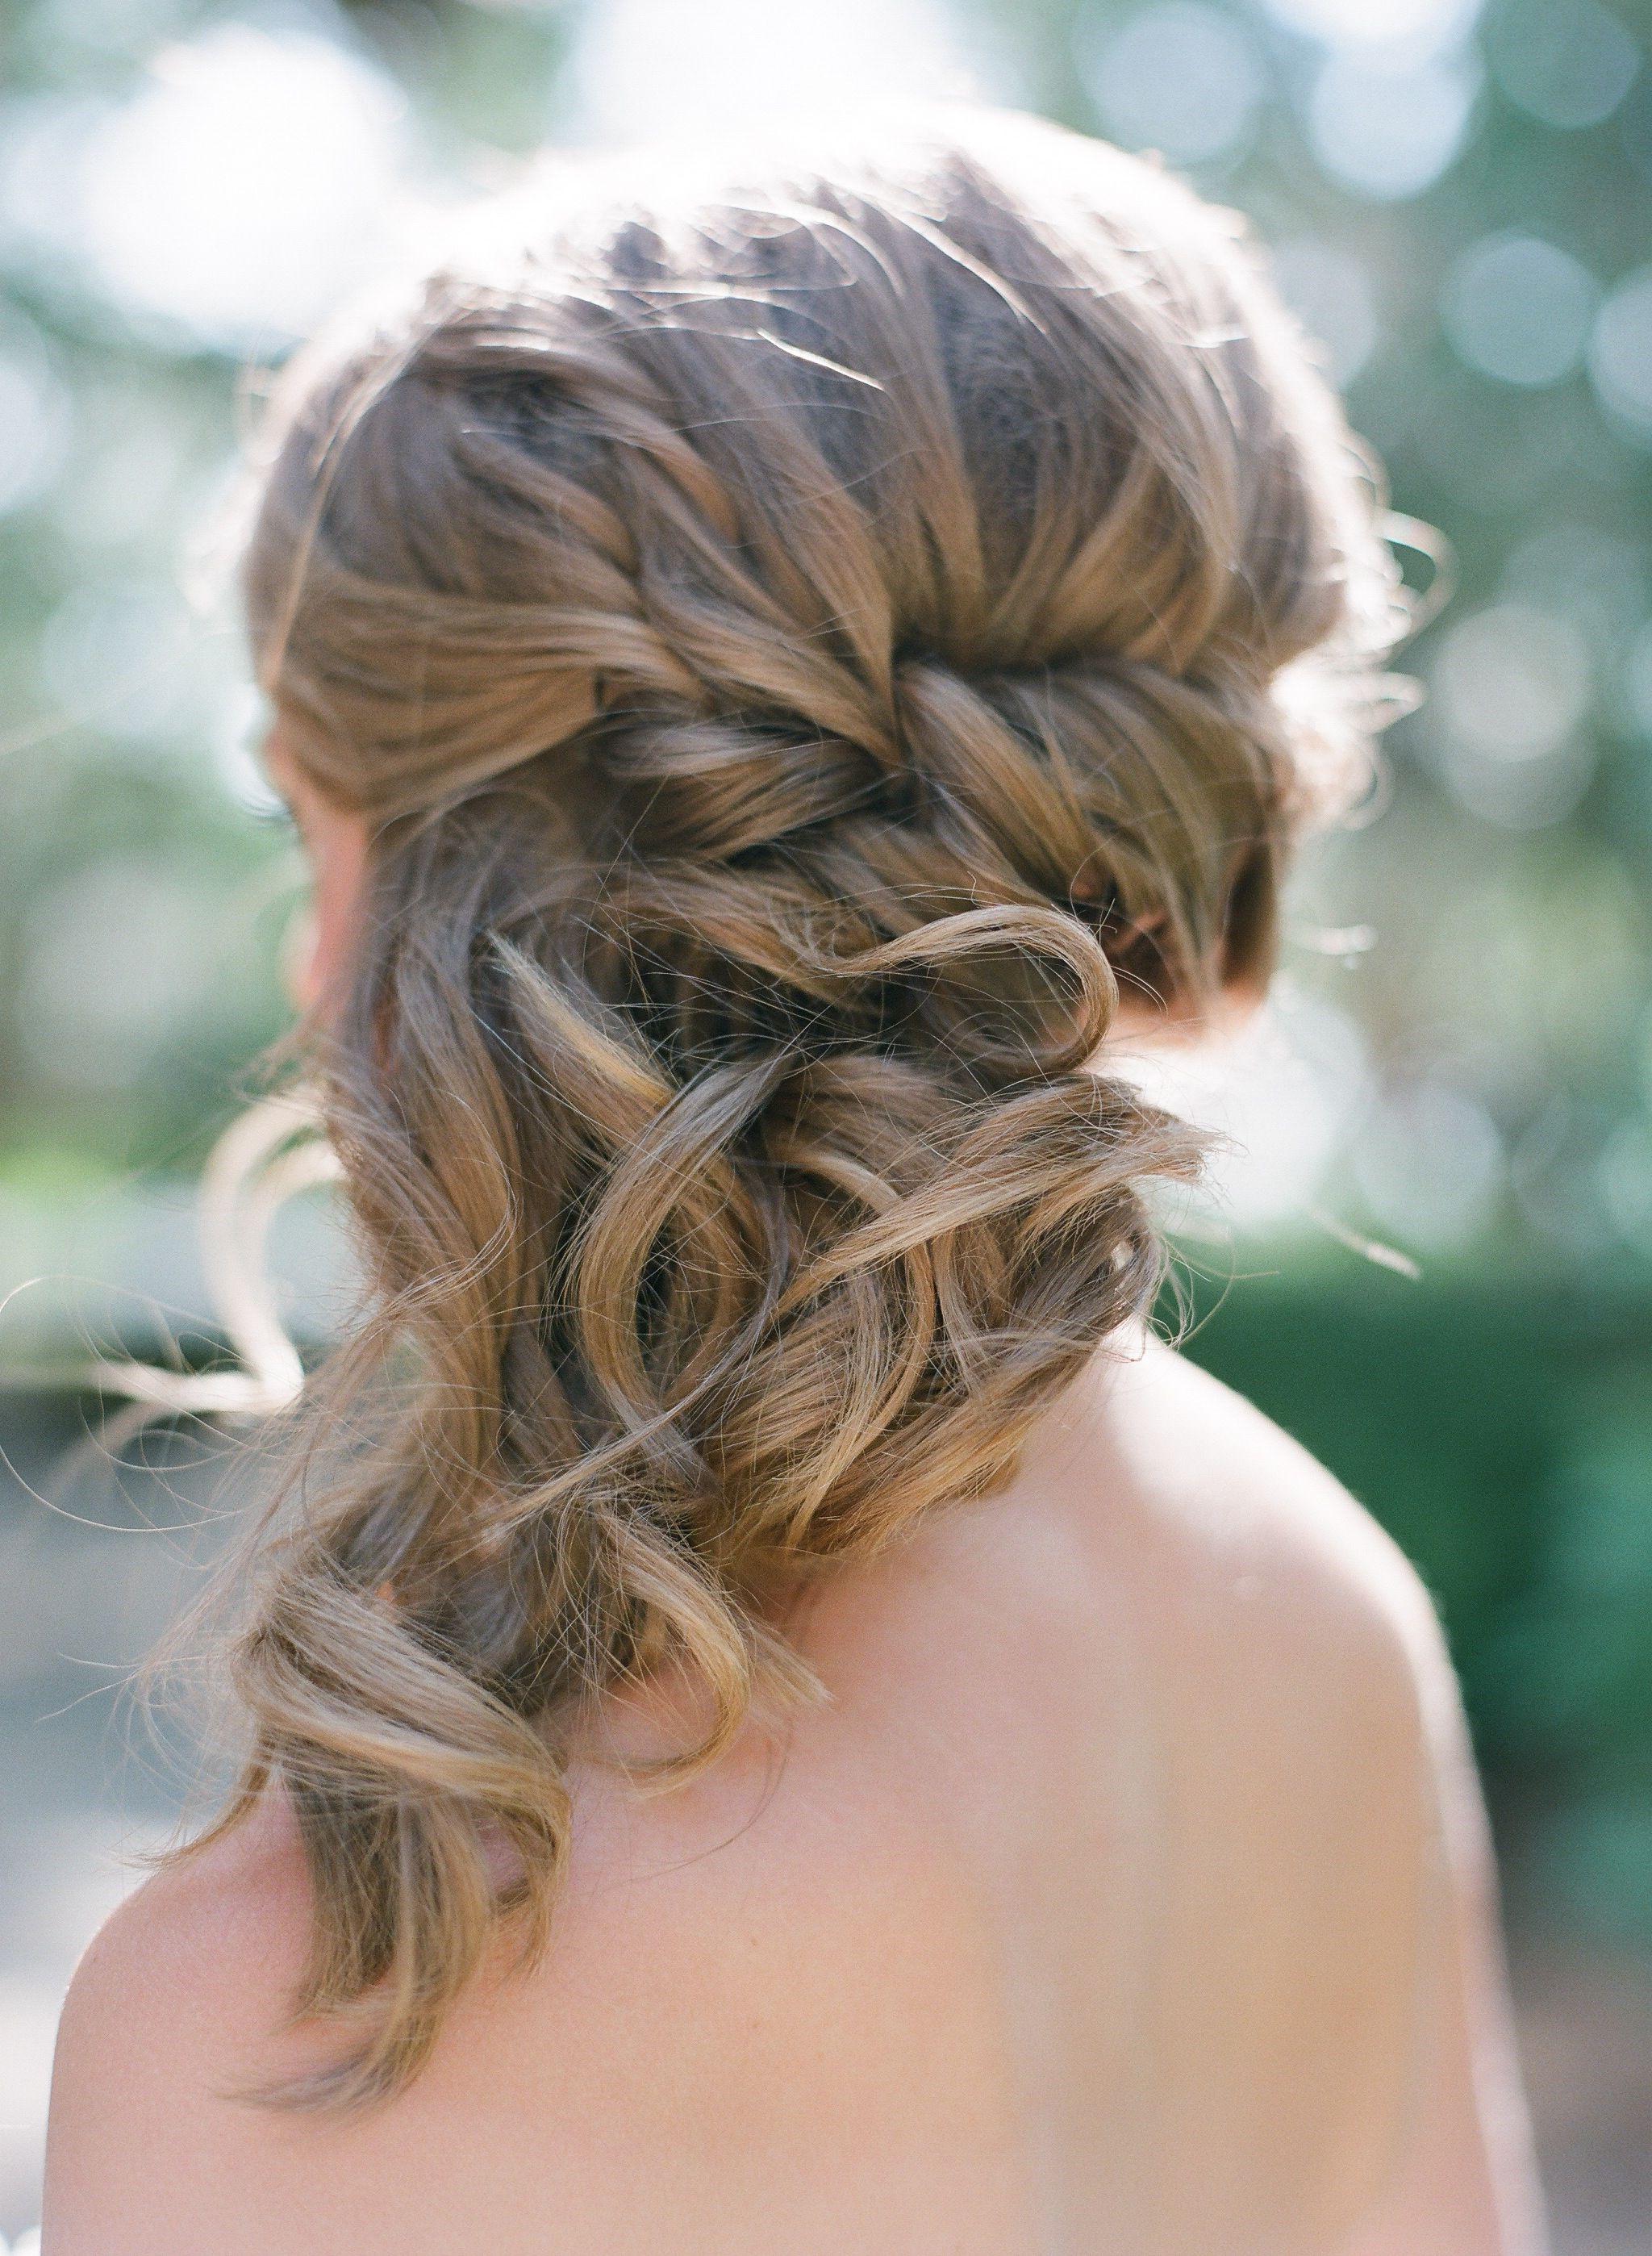 Women's Hair (View 20 of 20)